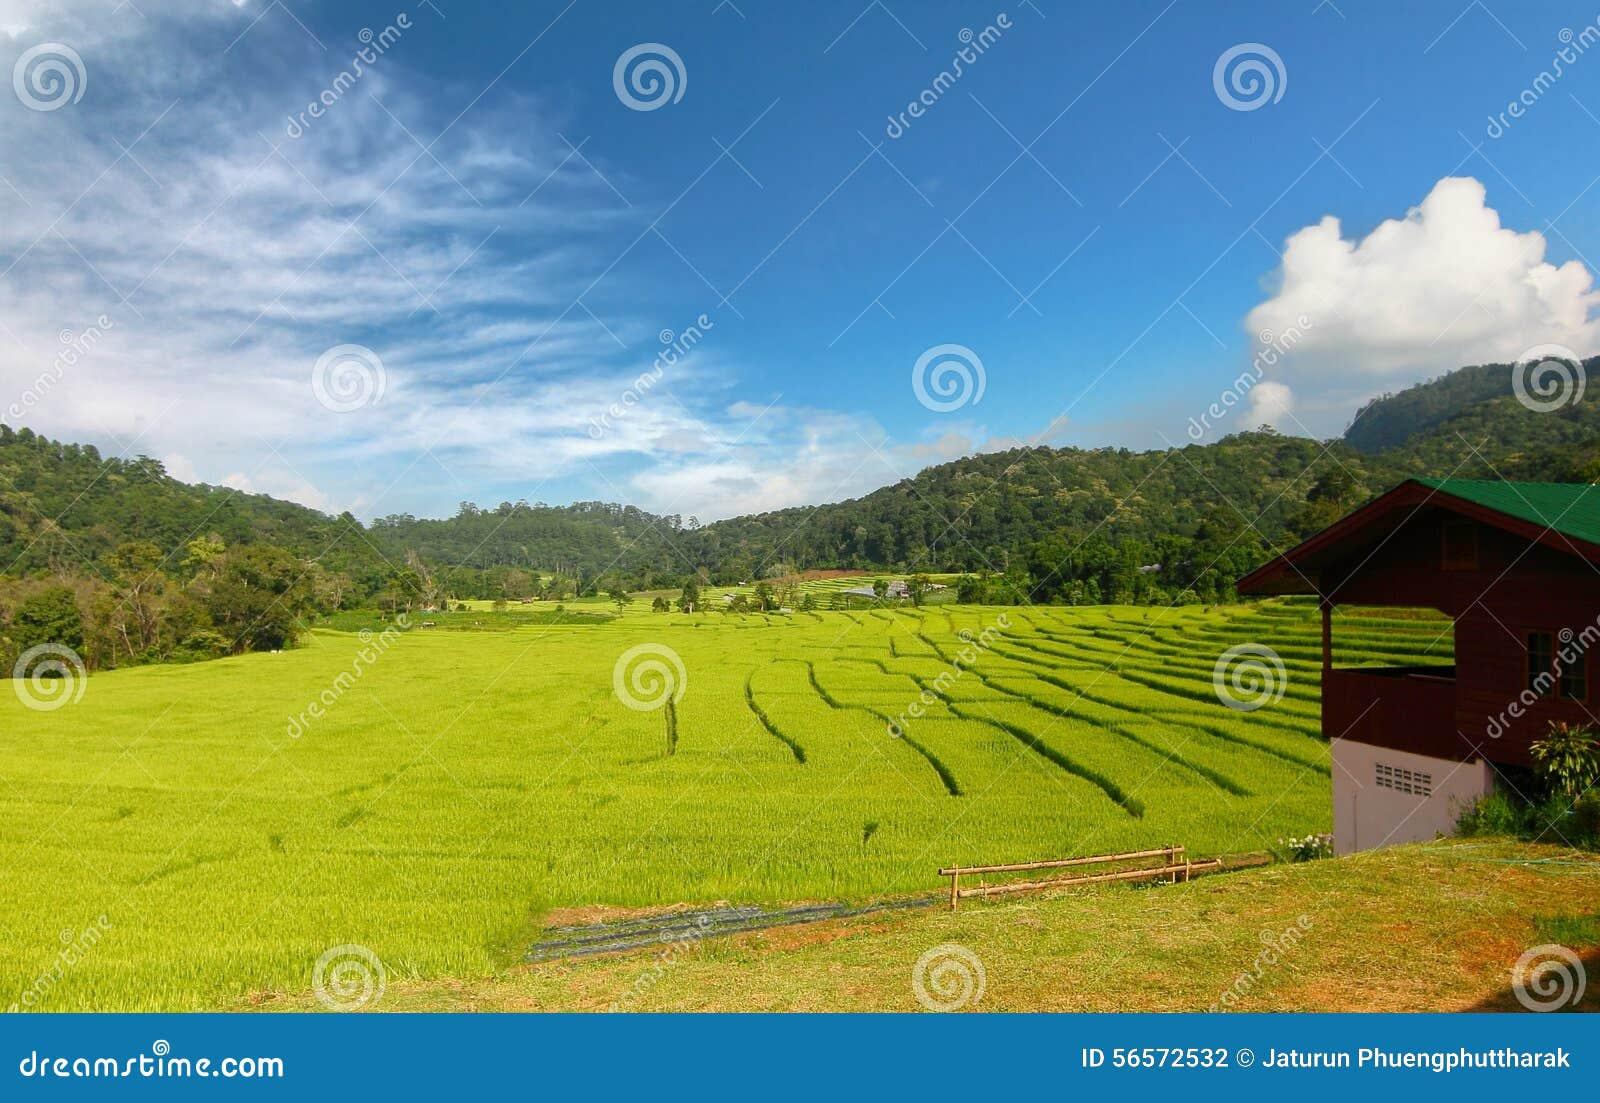 Download Terraced τομέας ρυζιού σε Chiangmai, Ταϊλάνδη Στοκ Εικόνες - εικόνα από ορυζώνας, ορόσημο: 56572532